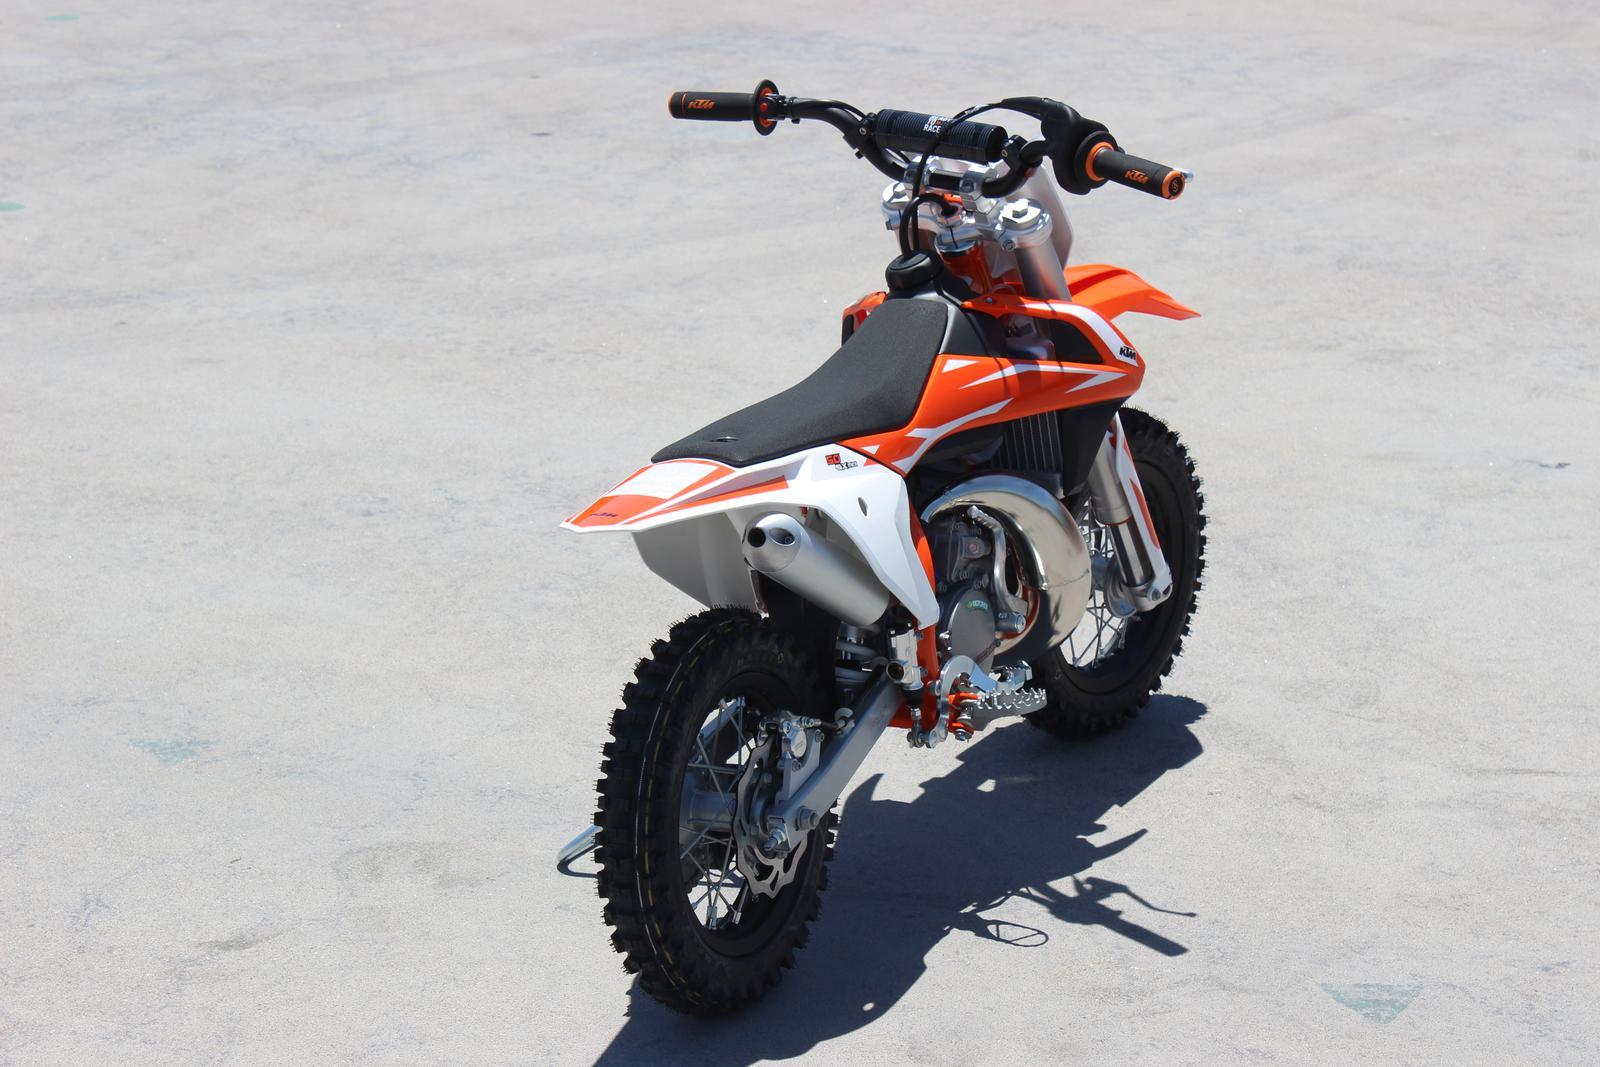 2018 ktm 50 sx mini for sale in scottsdale, az | go az motorcycles